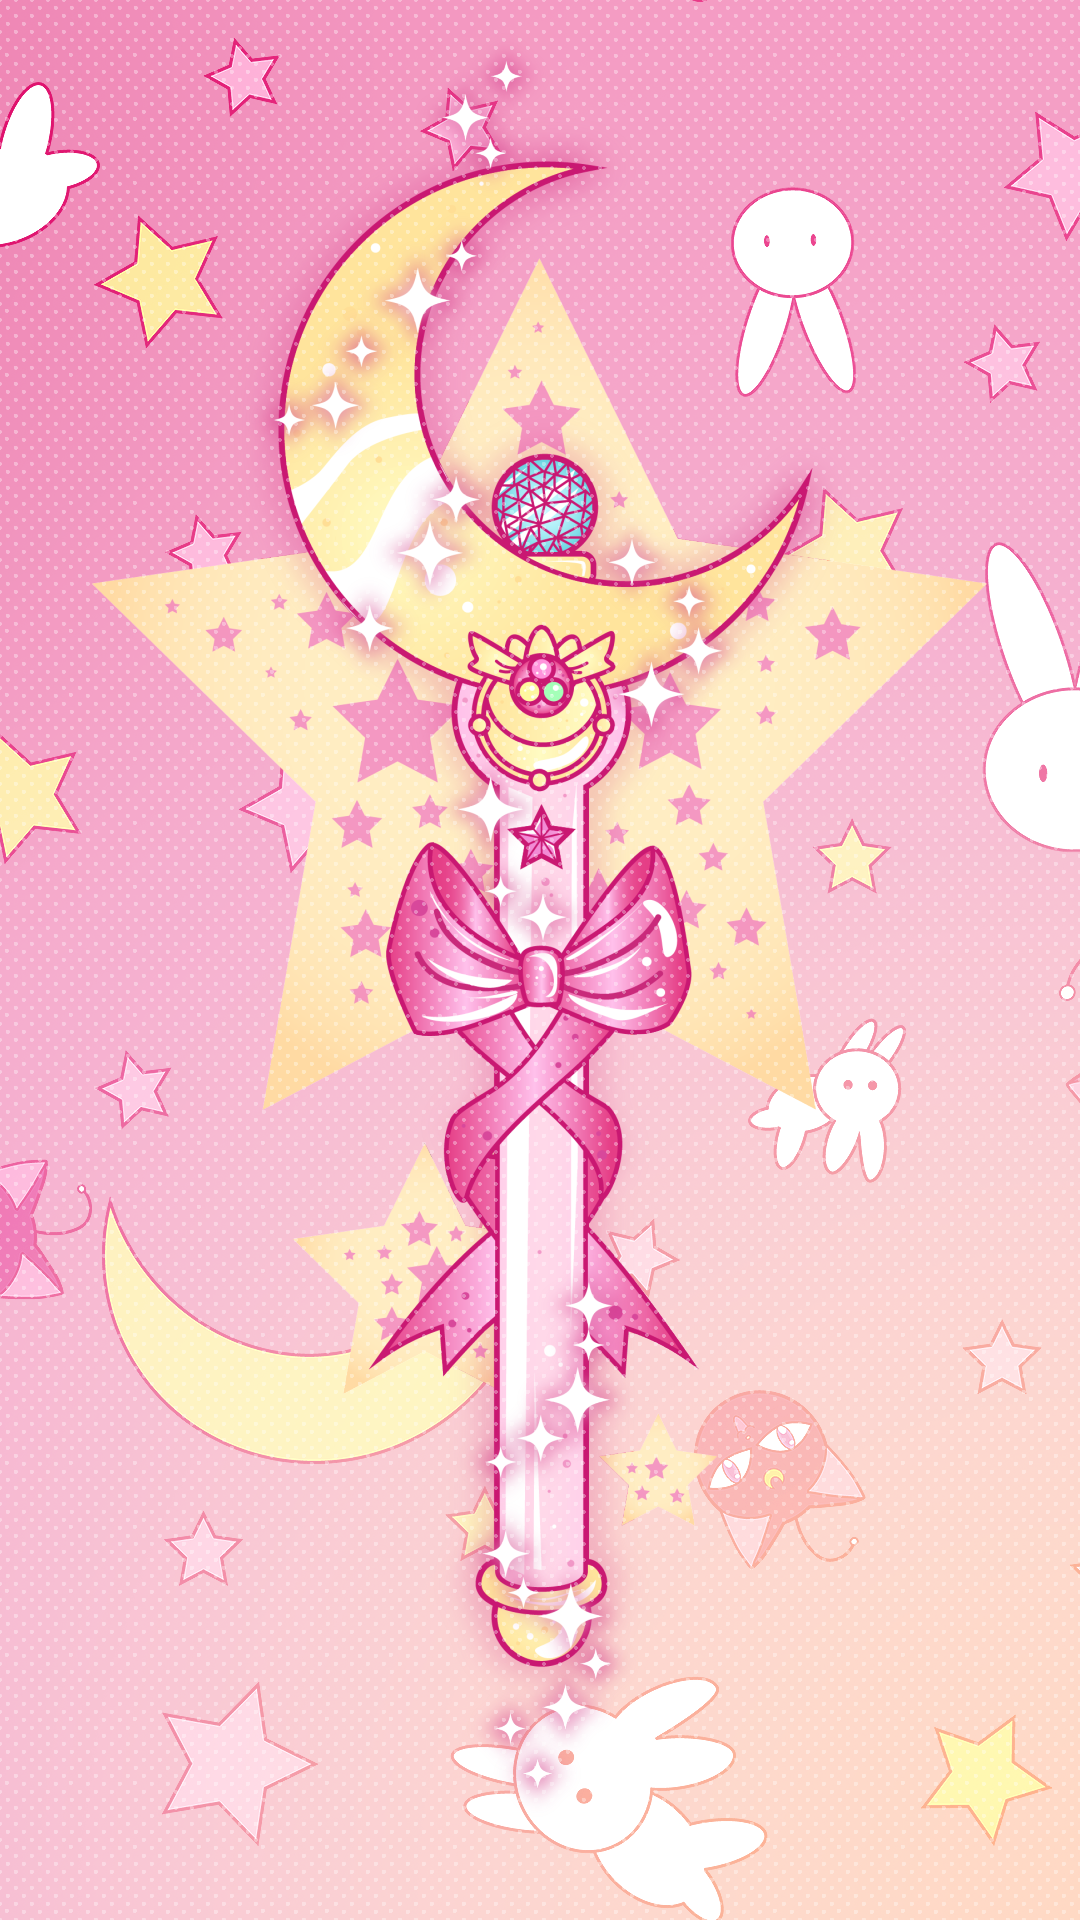 Sailor moon cute pink wallpaper 1080 x 1920 HD (anime